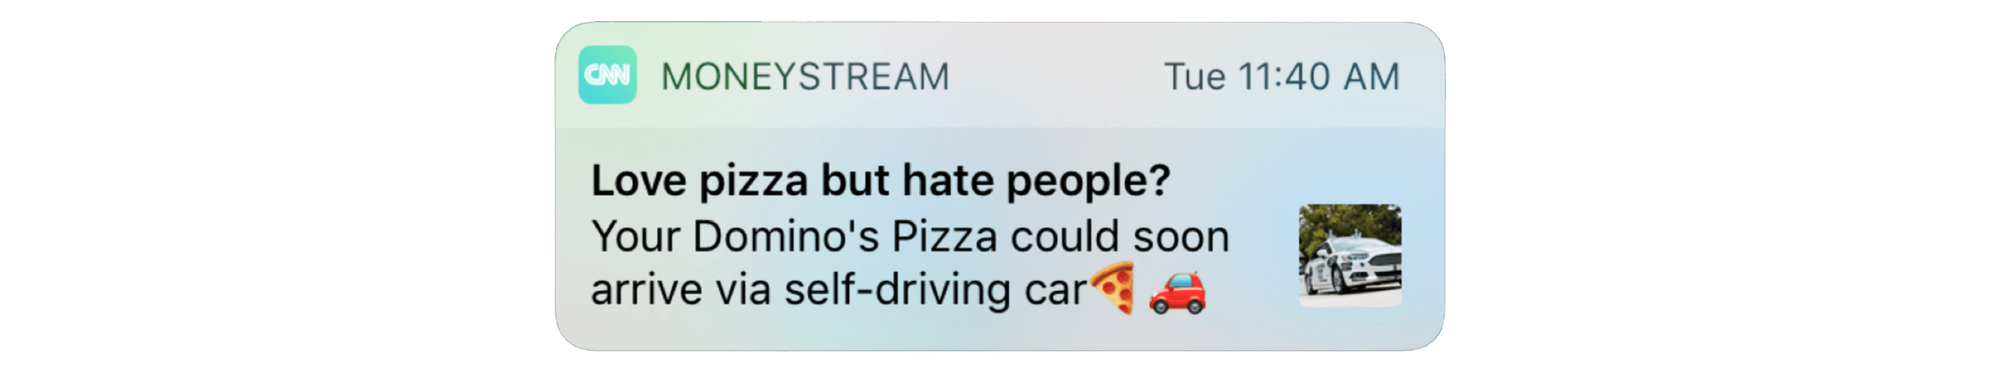 Effective push notification example